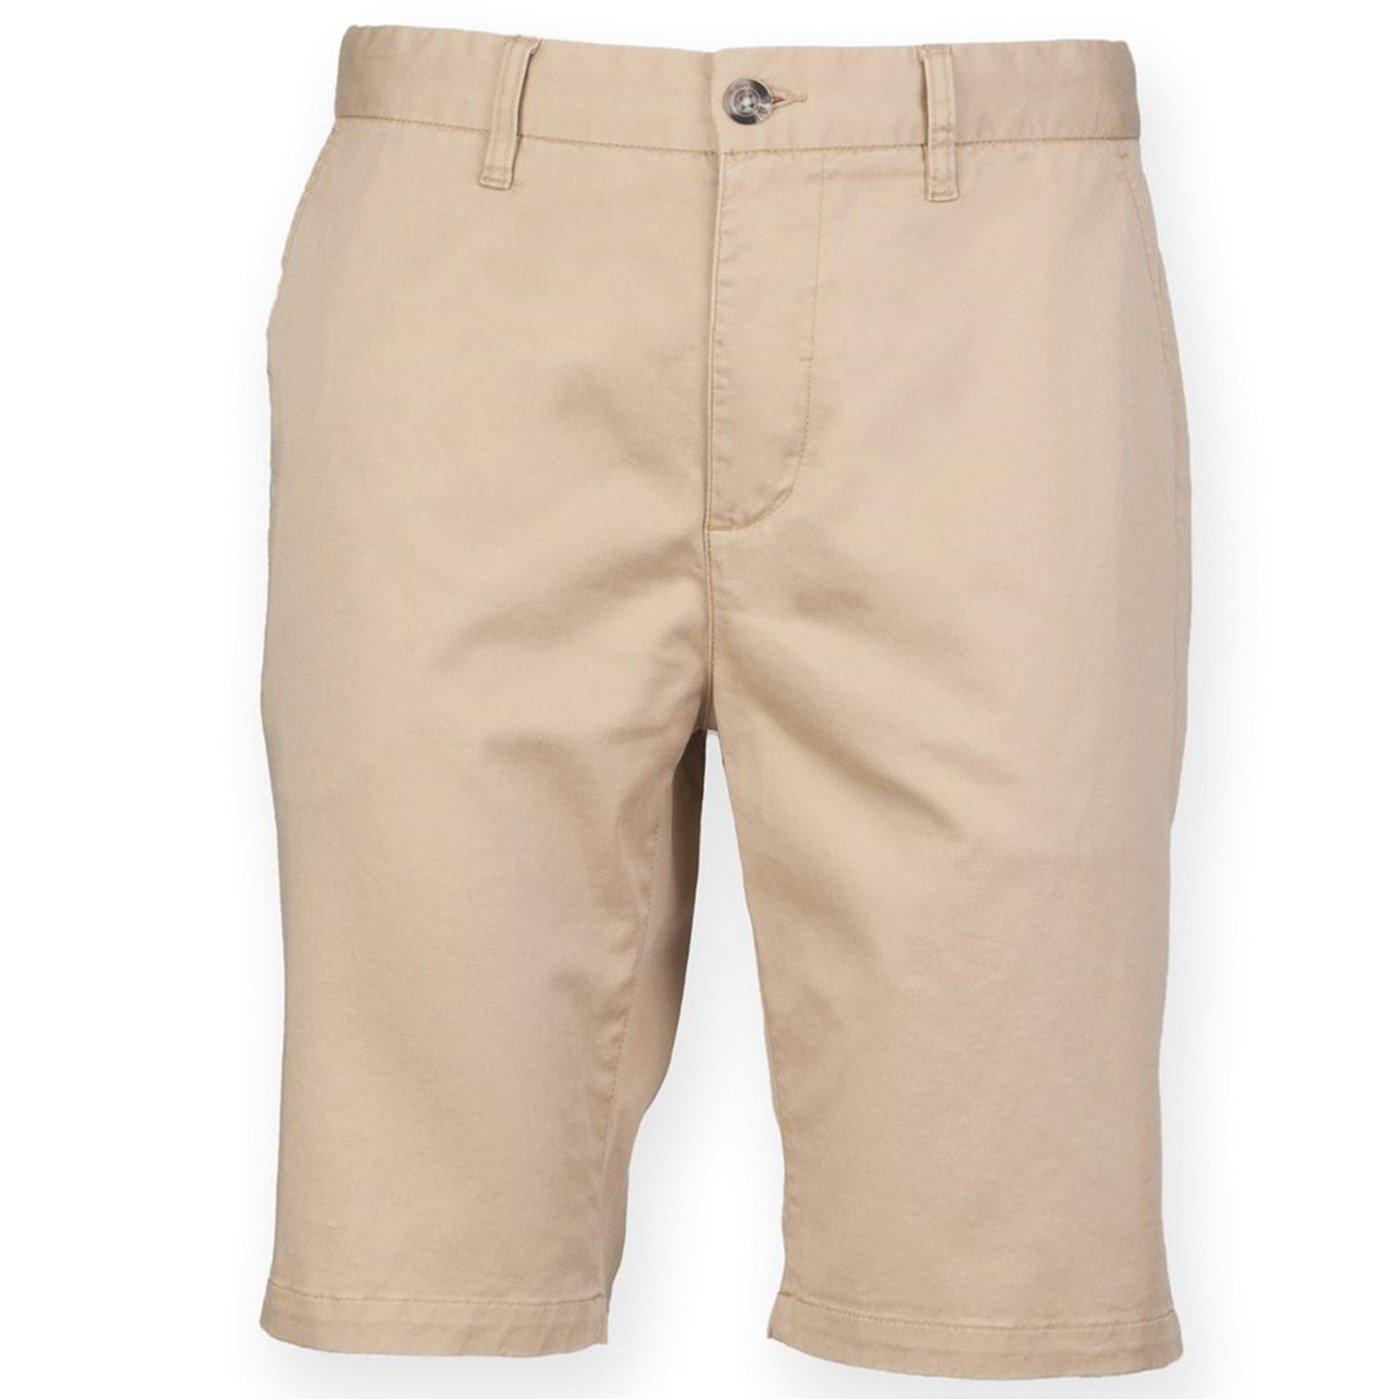 b58c362fa68 Sports Apparel Front Row Mens Board Shorts